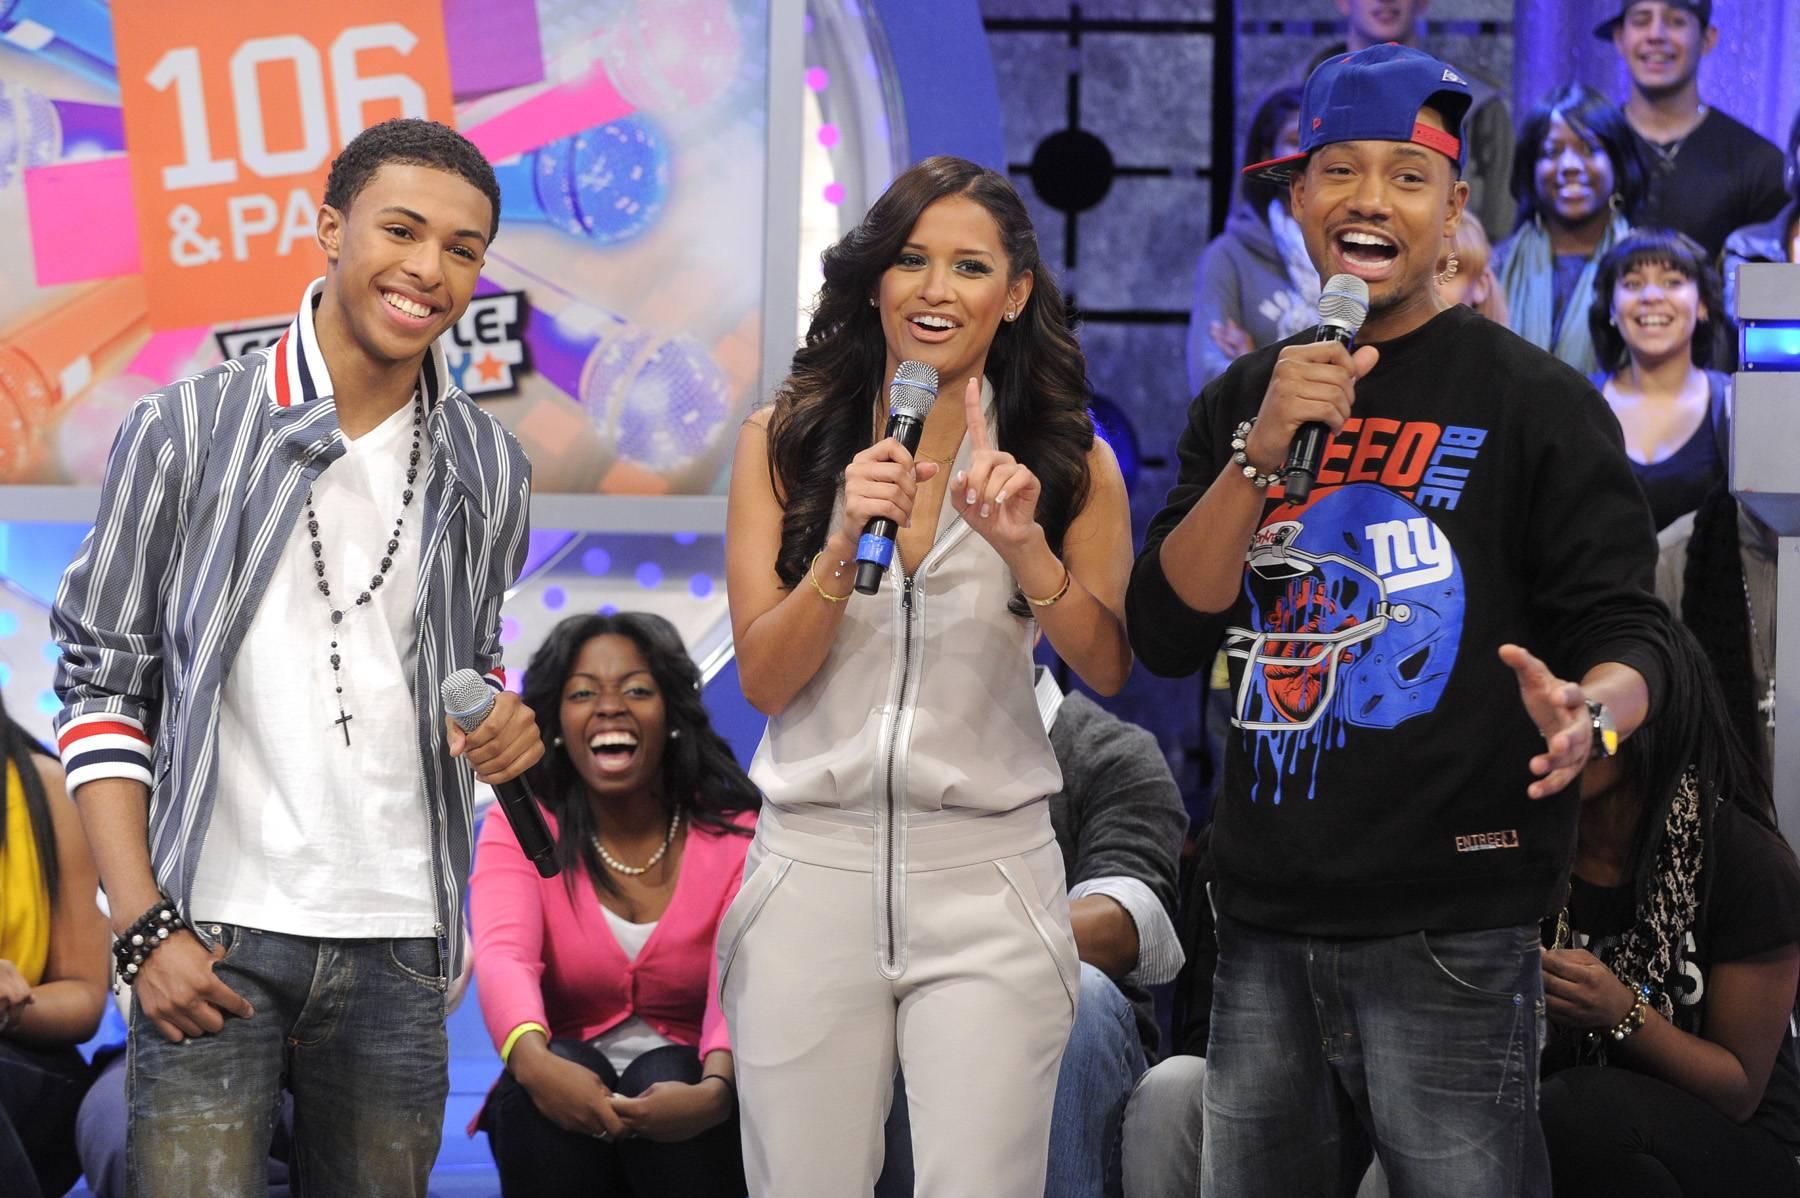 Holla - Diggy Simmons with Rocsi Diaz and Terrence J at 106 & Park, January 20, 2012. (Photo: John Ricard / BET)